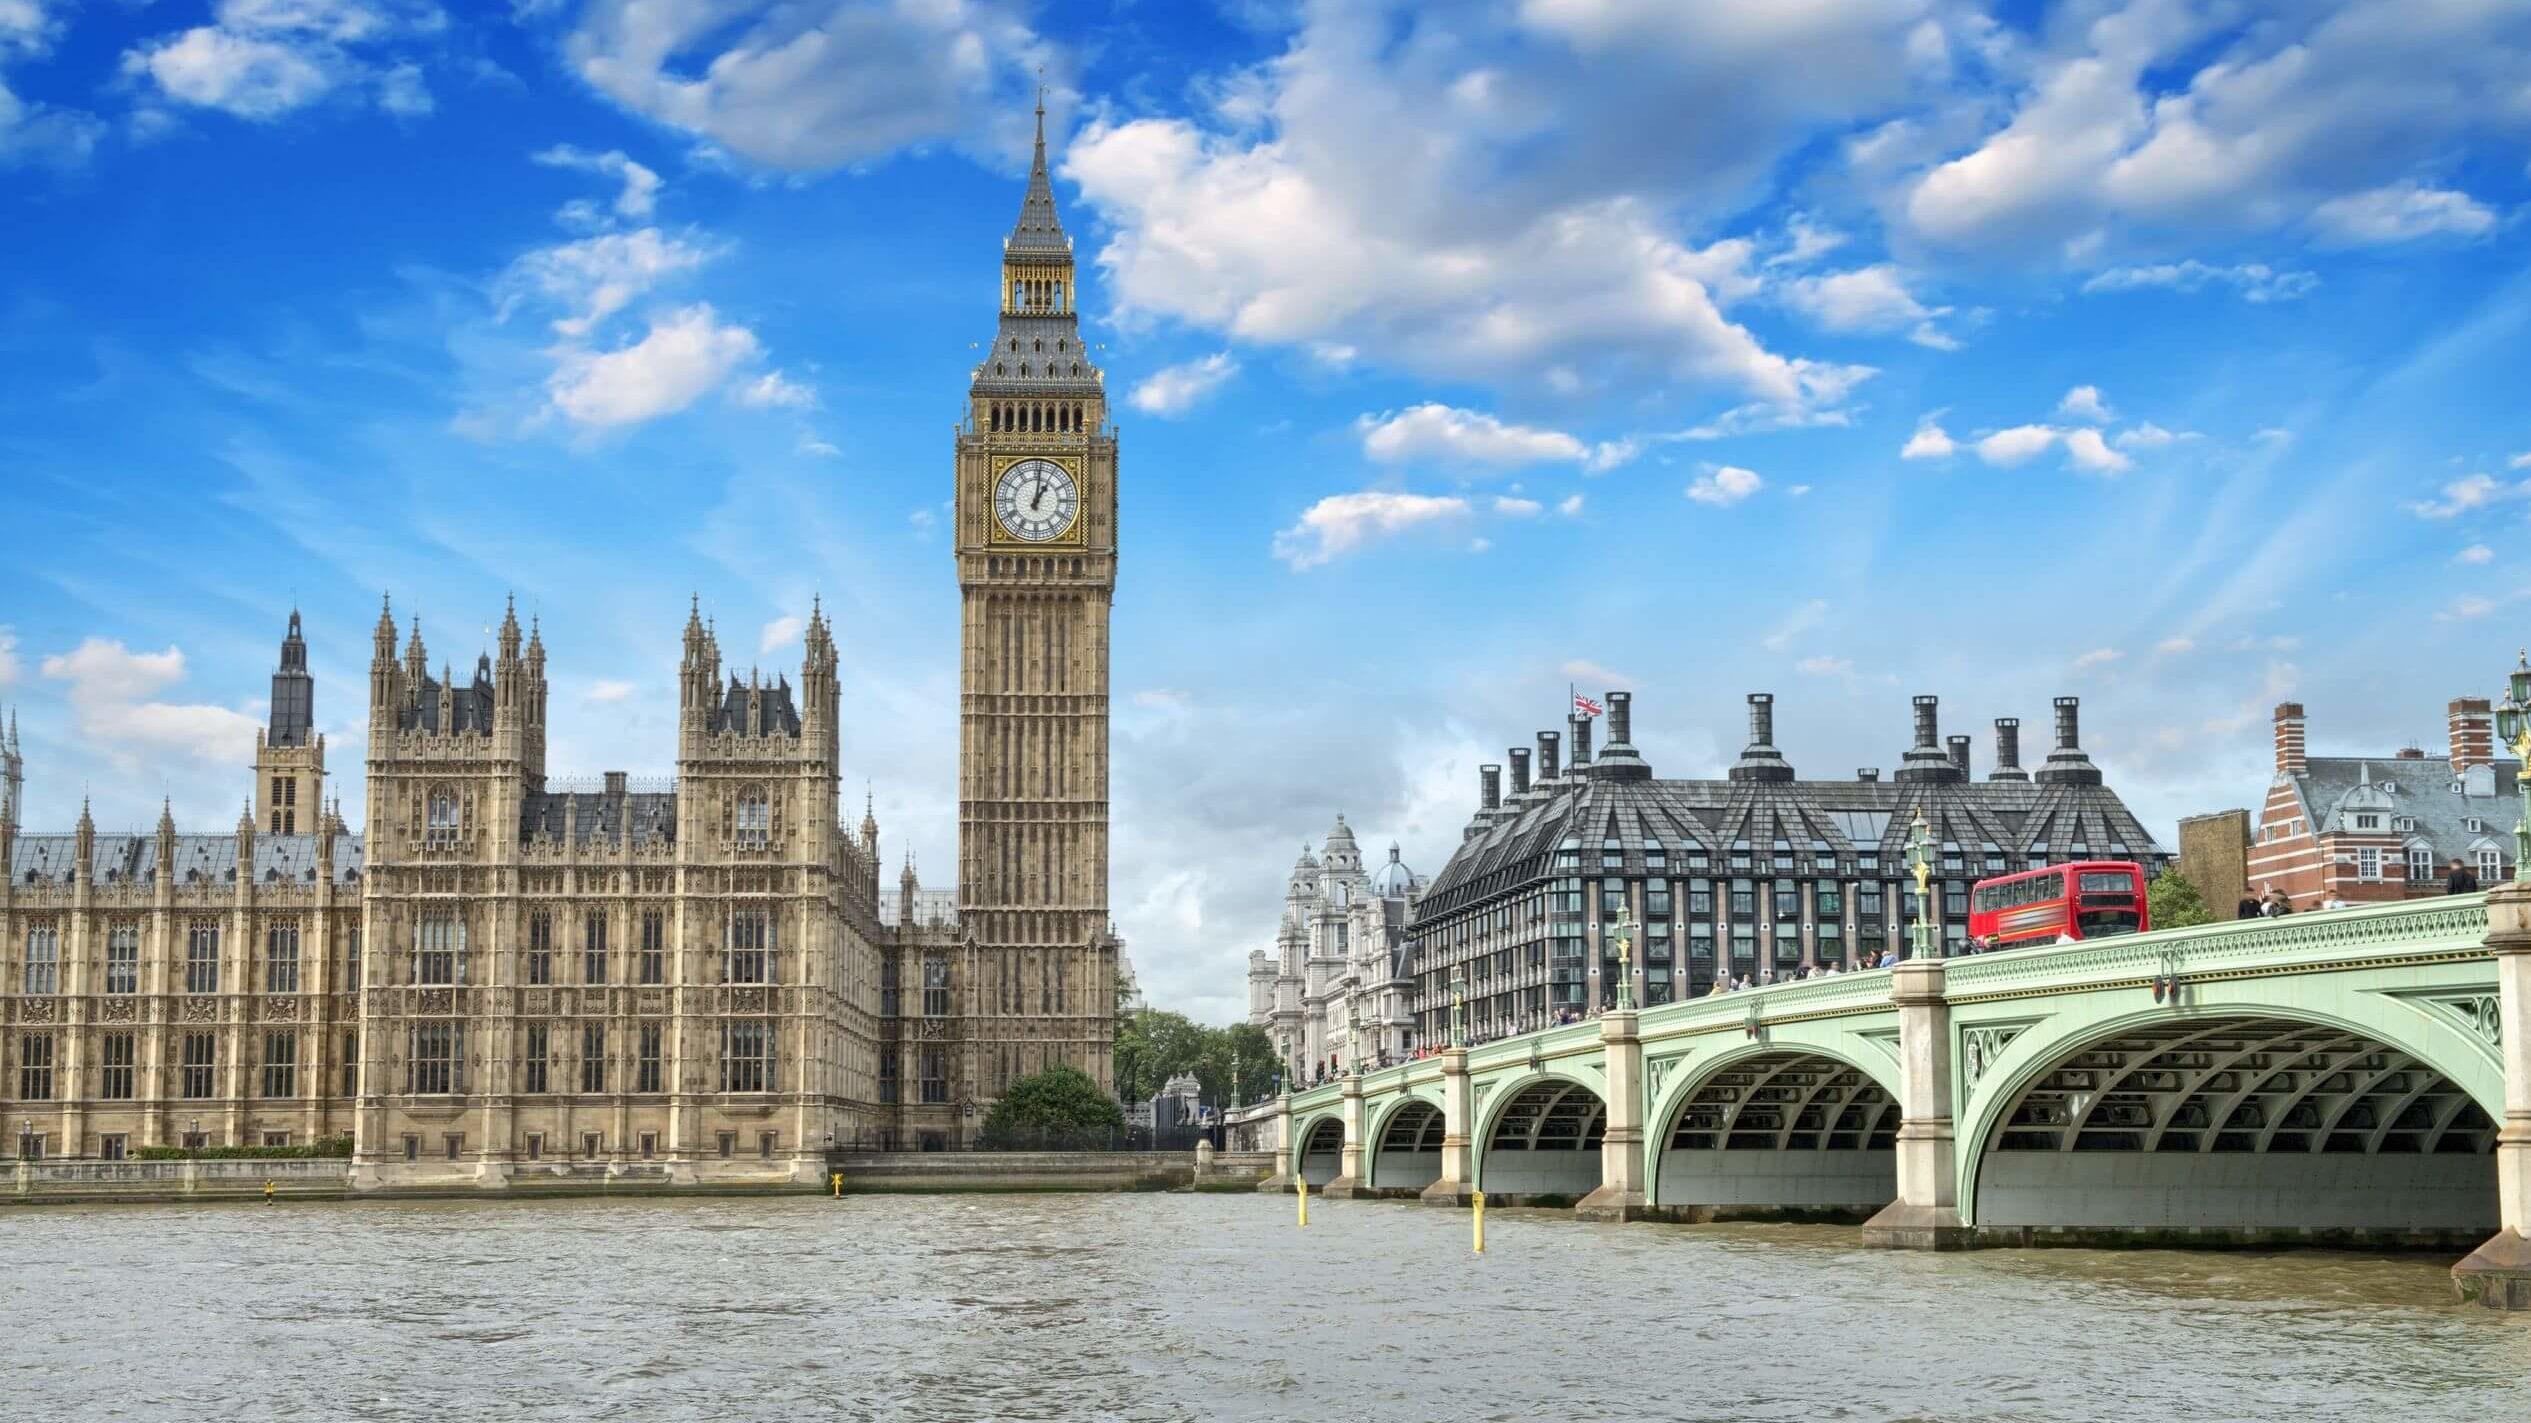 Wonen en werken in Londen als digital nomad